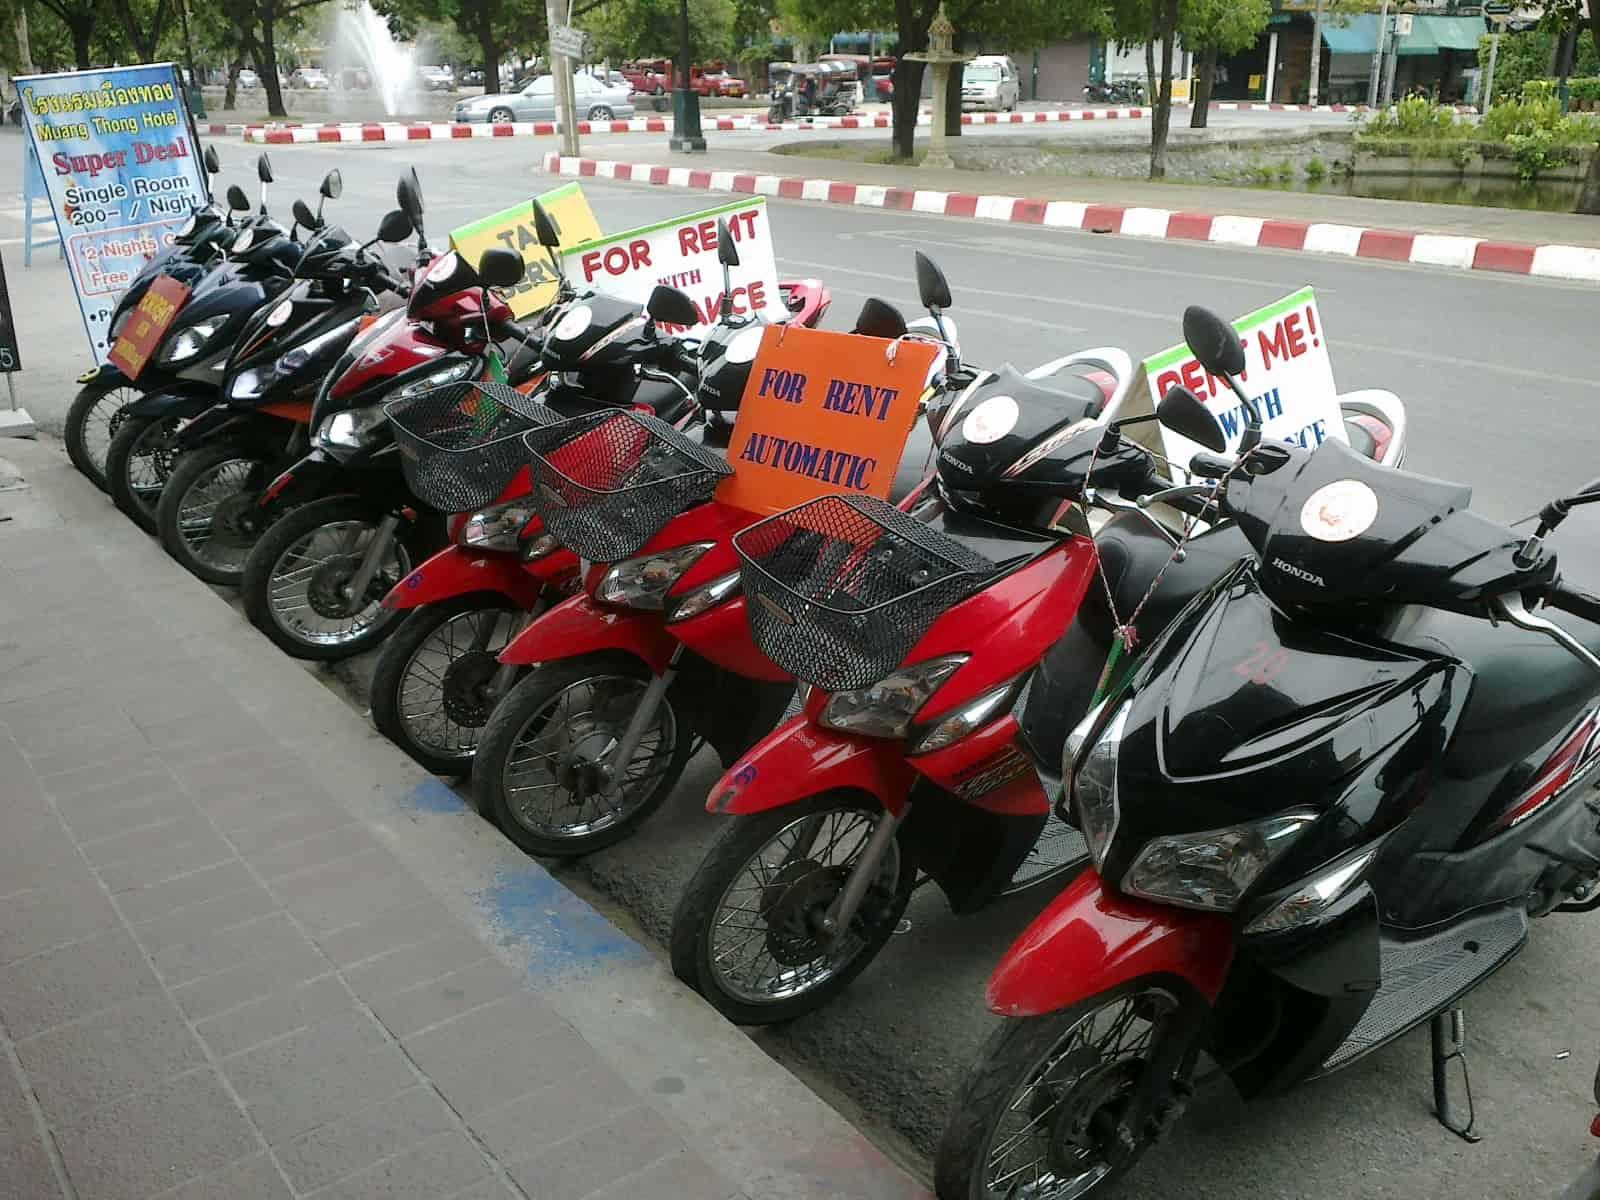 phu-quoc-motorbike-rental-shop